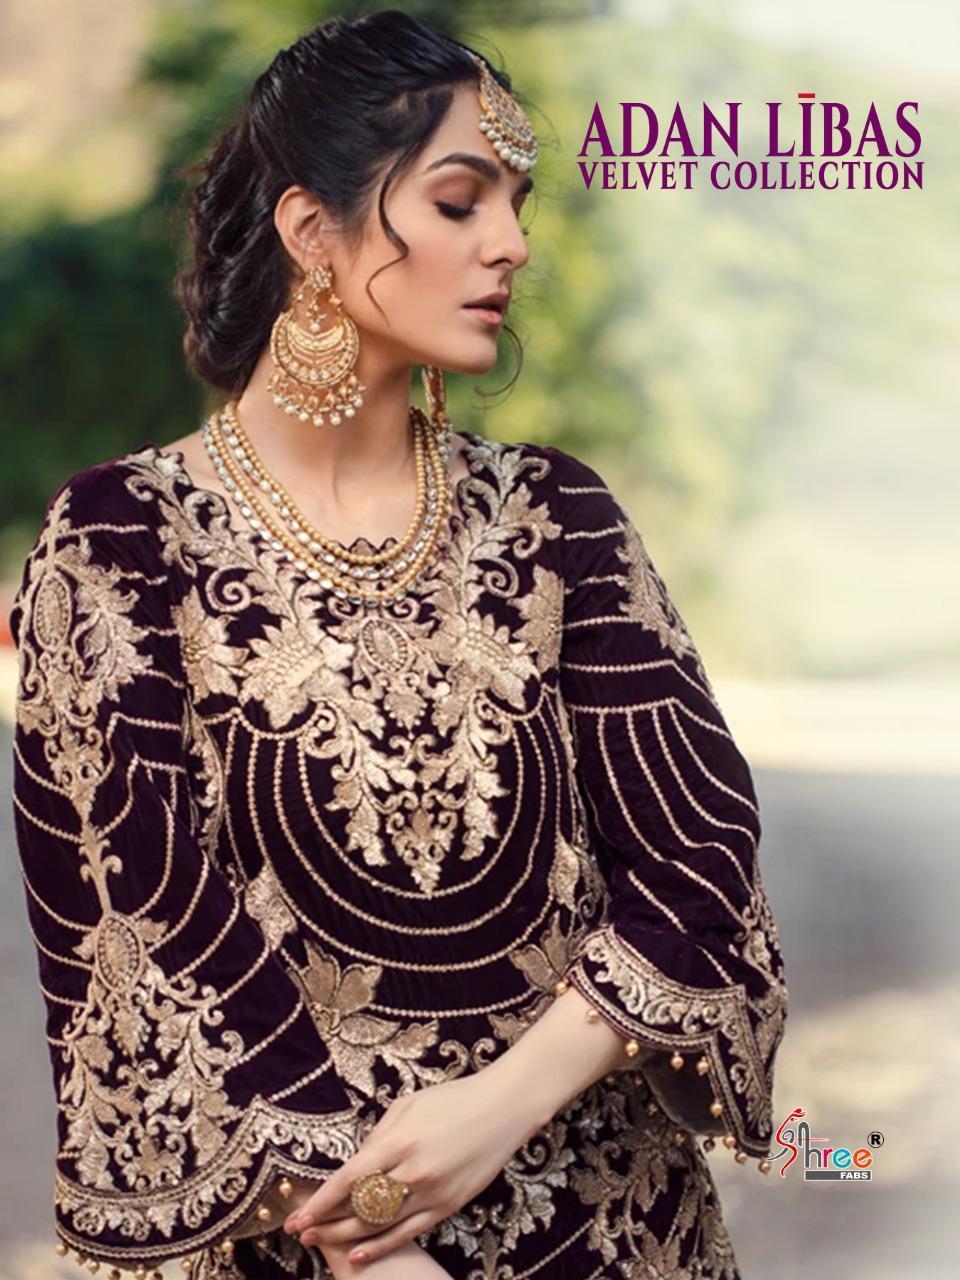 Shree Fab Adnan Libas Velvet Collection Designer Pure Velvet With Heavy Embroidery Work Partywear Pakistani Pettern Suits Wholesale